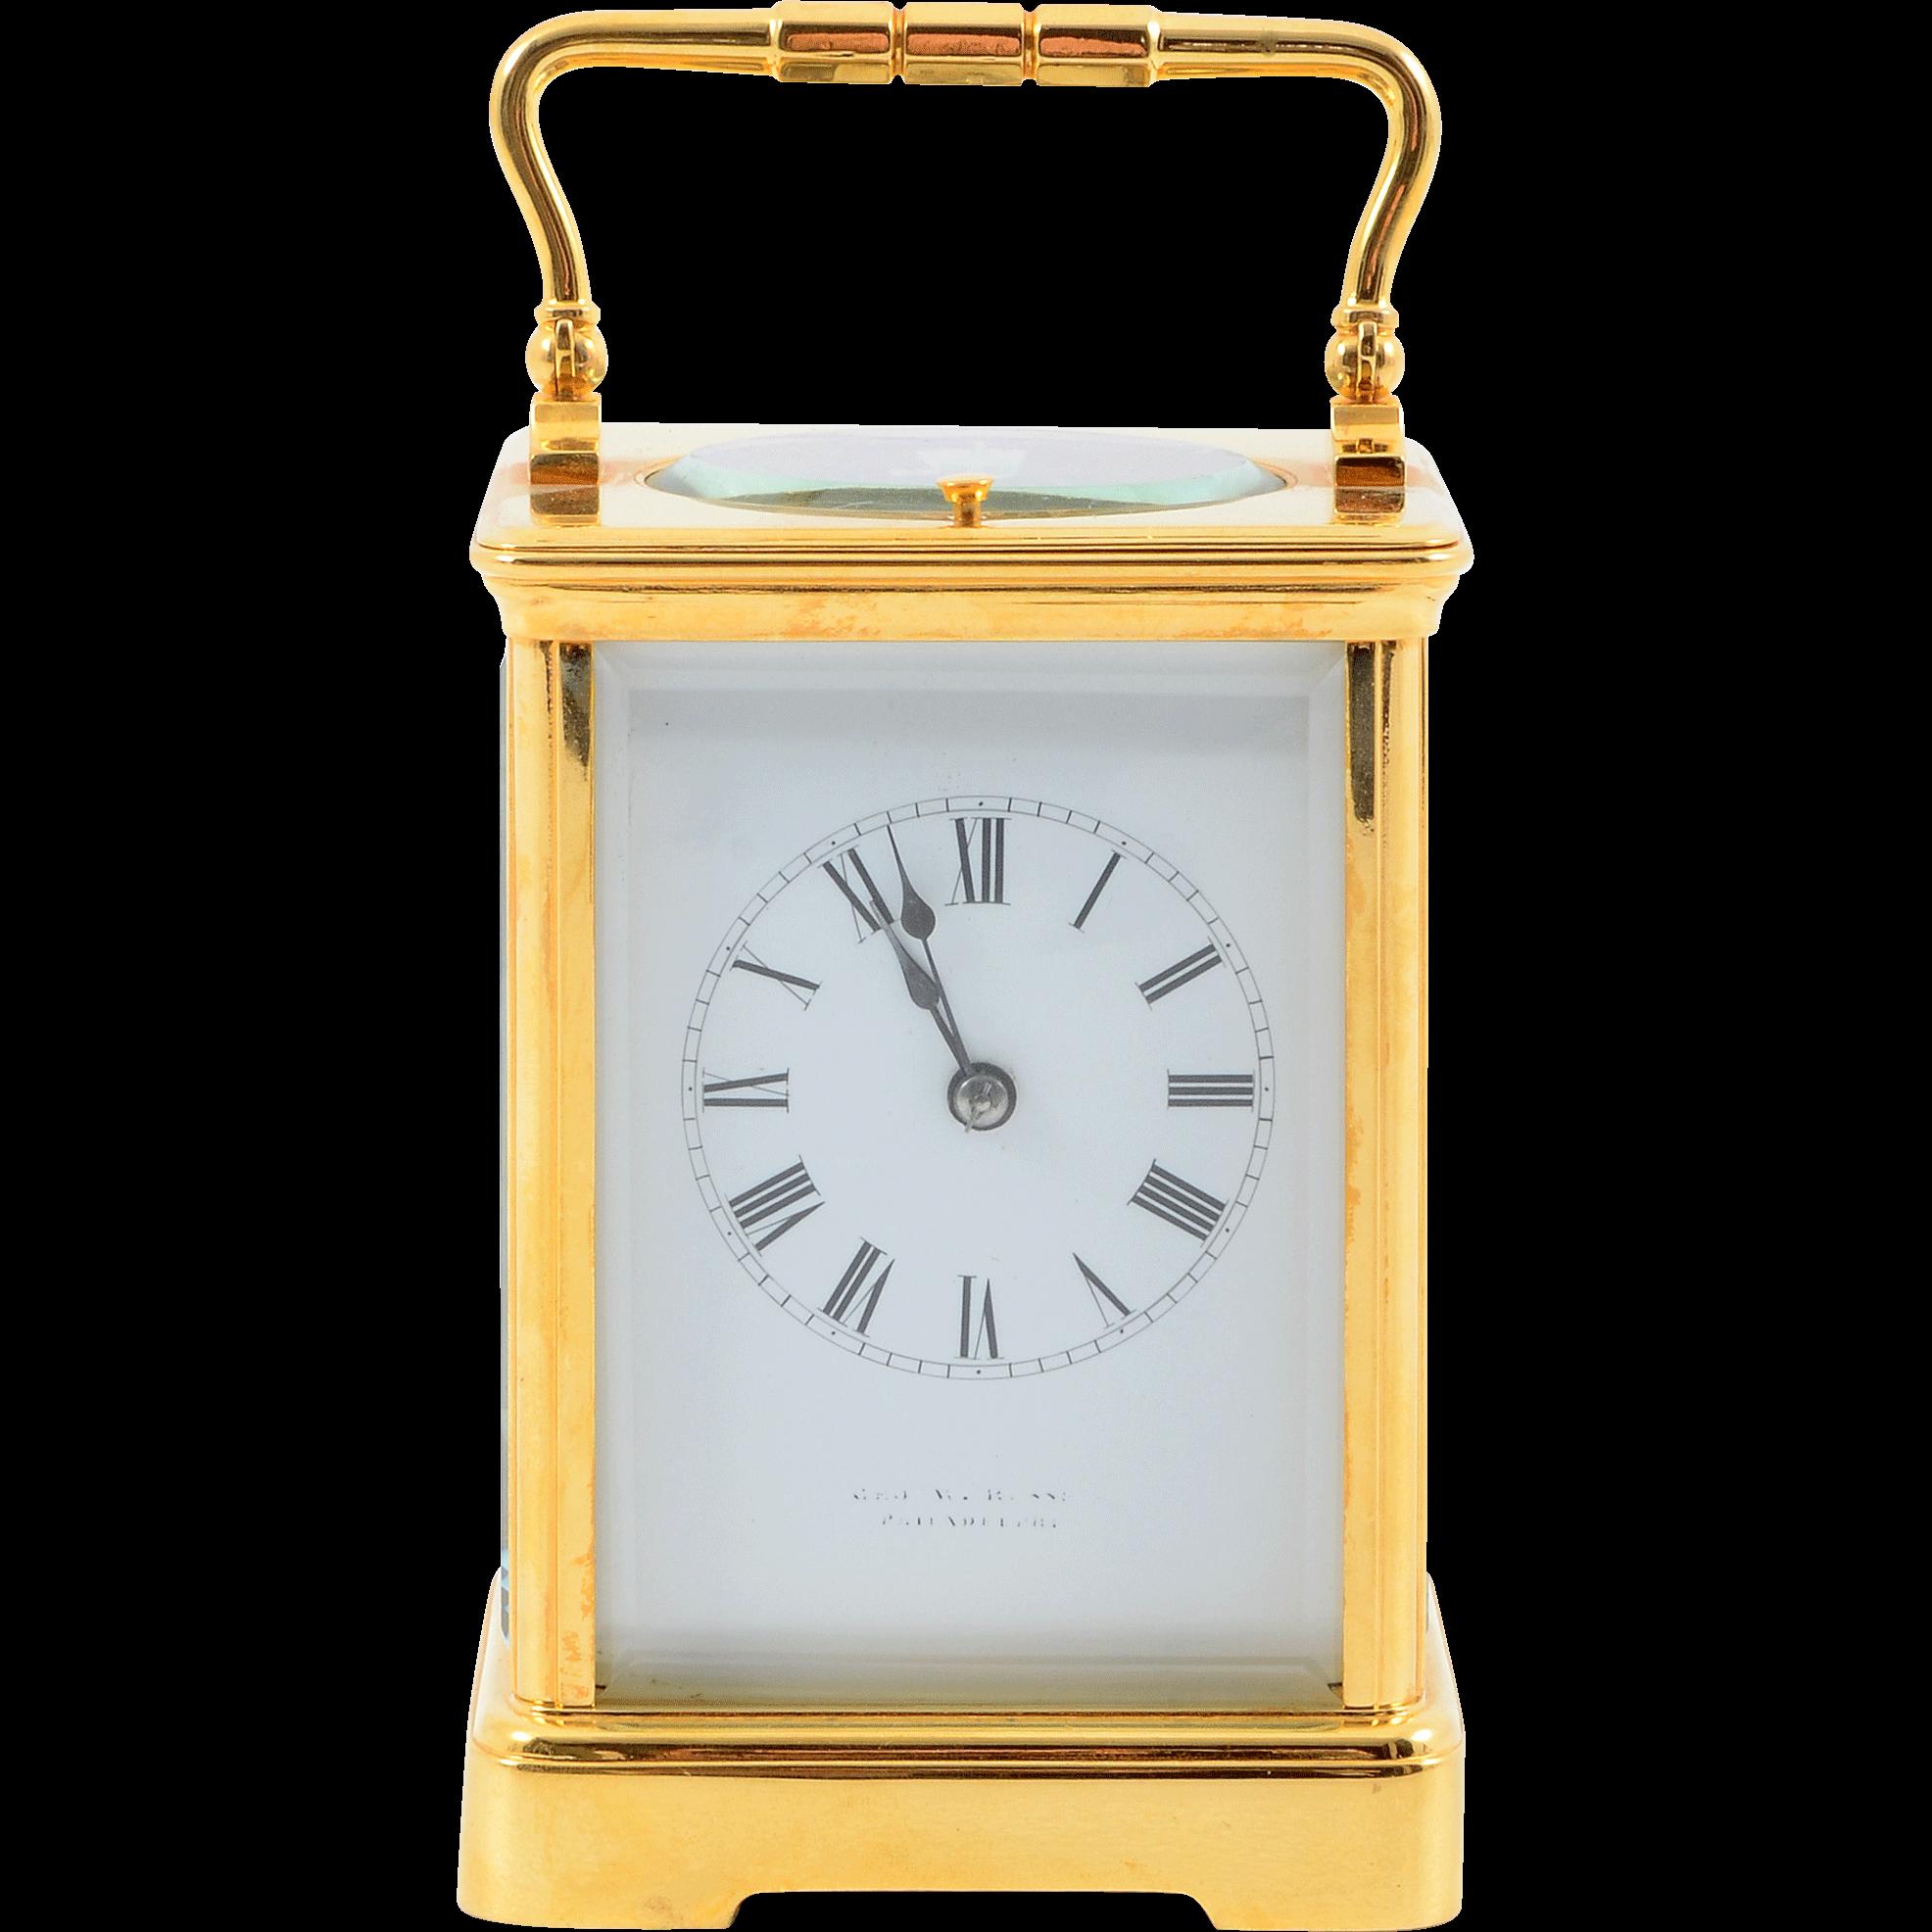 French Gilt Brass Corniche Case Carriage Clock